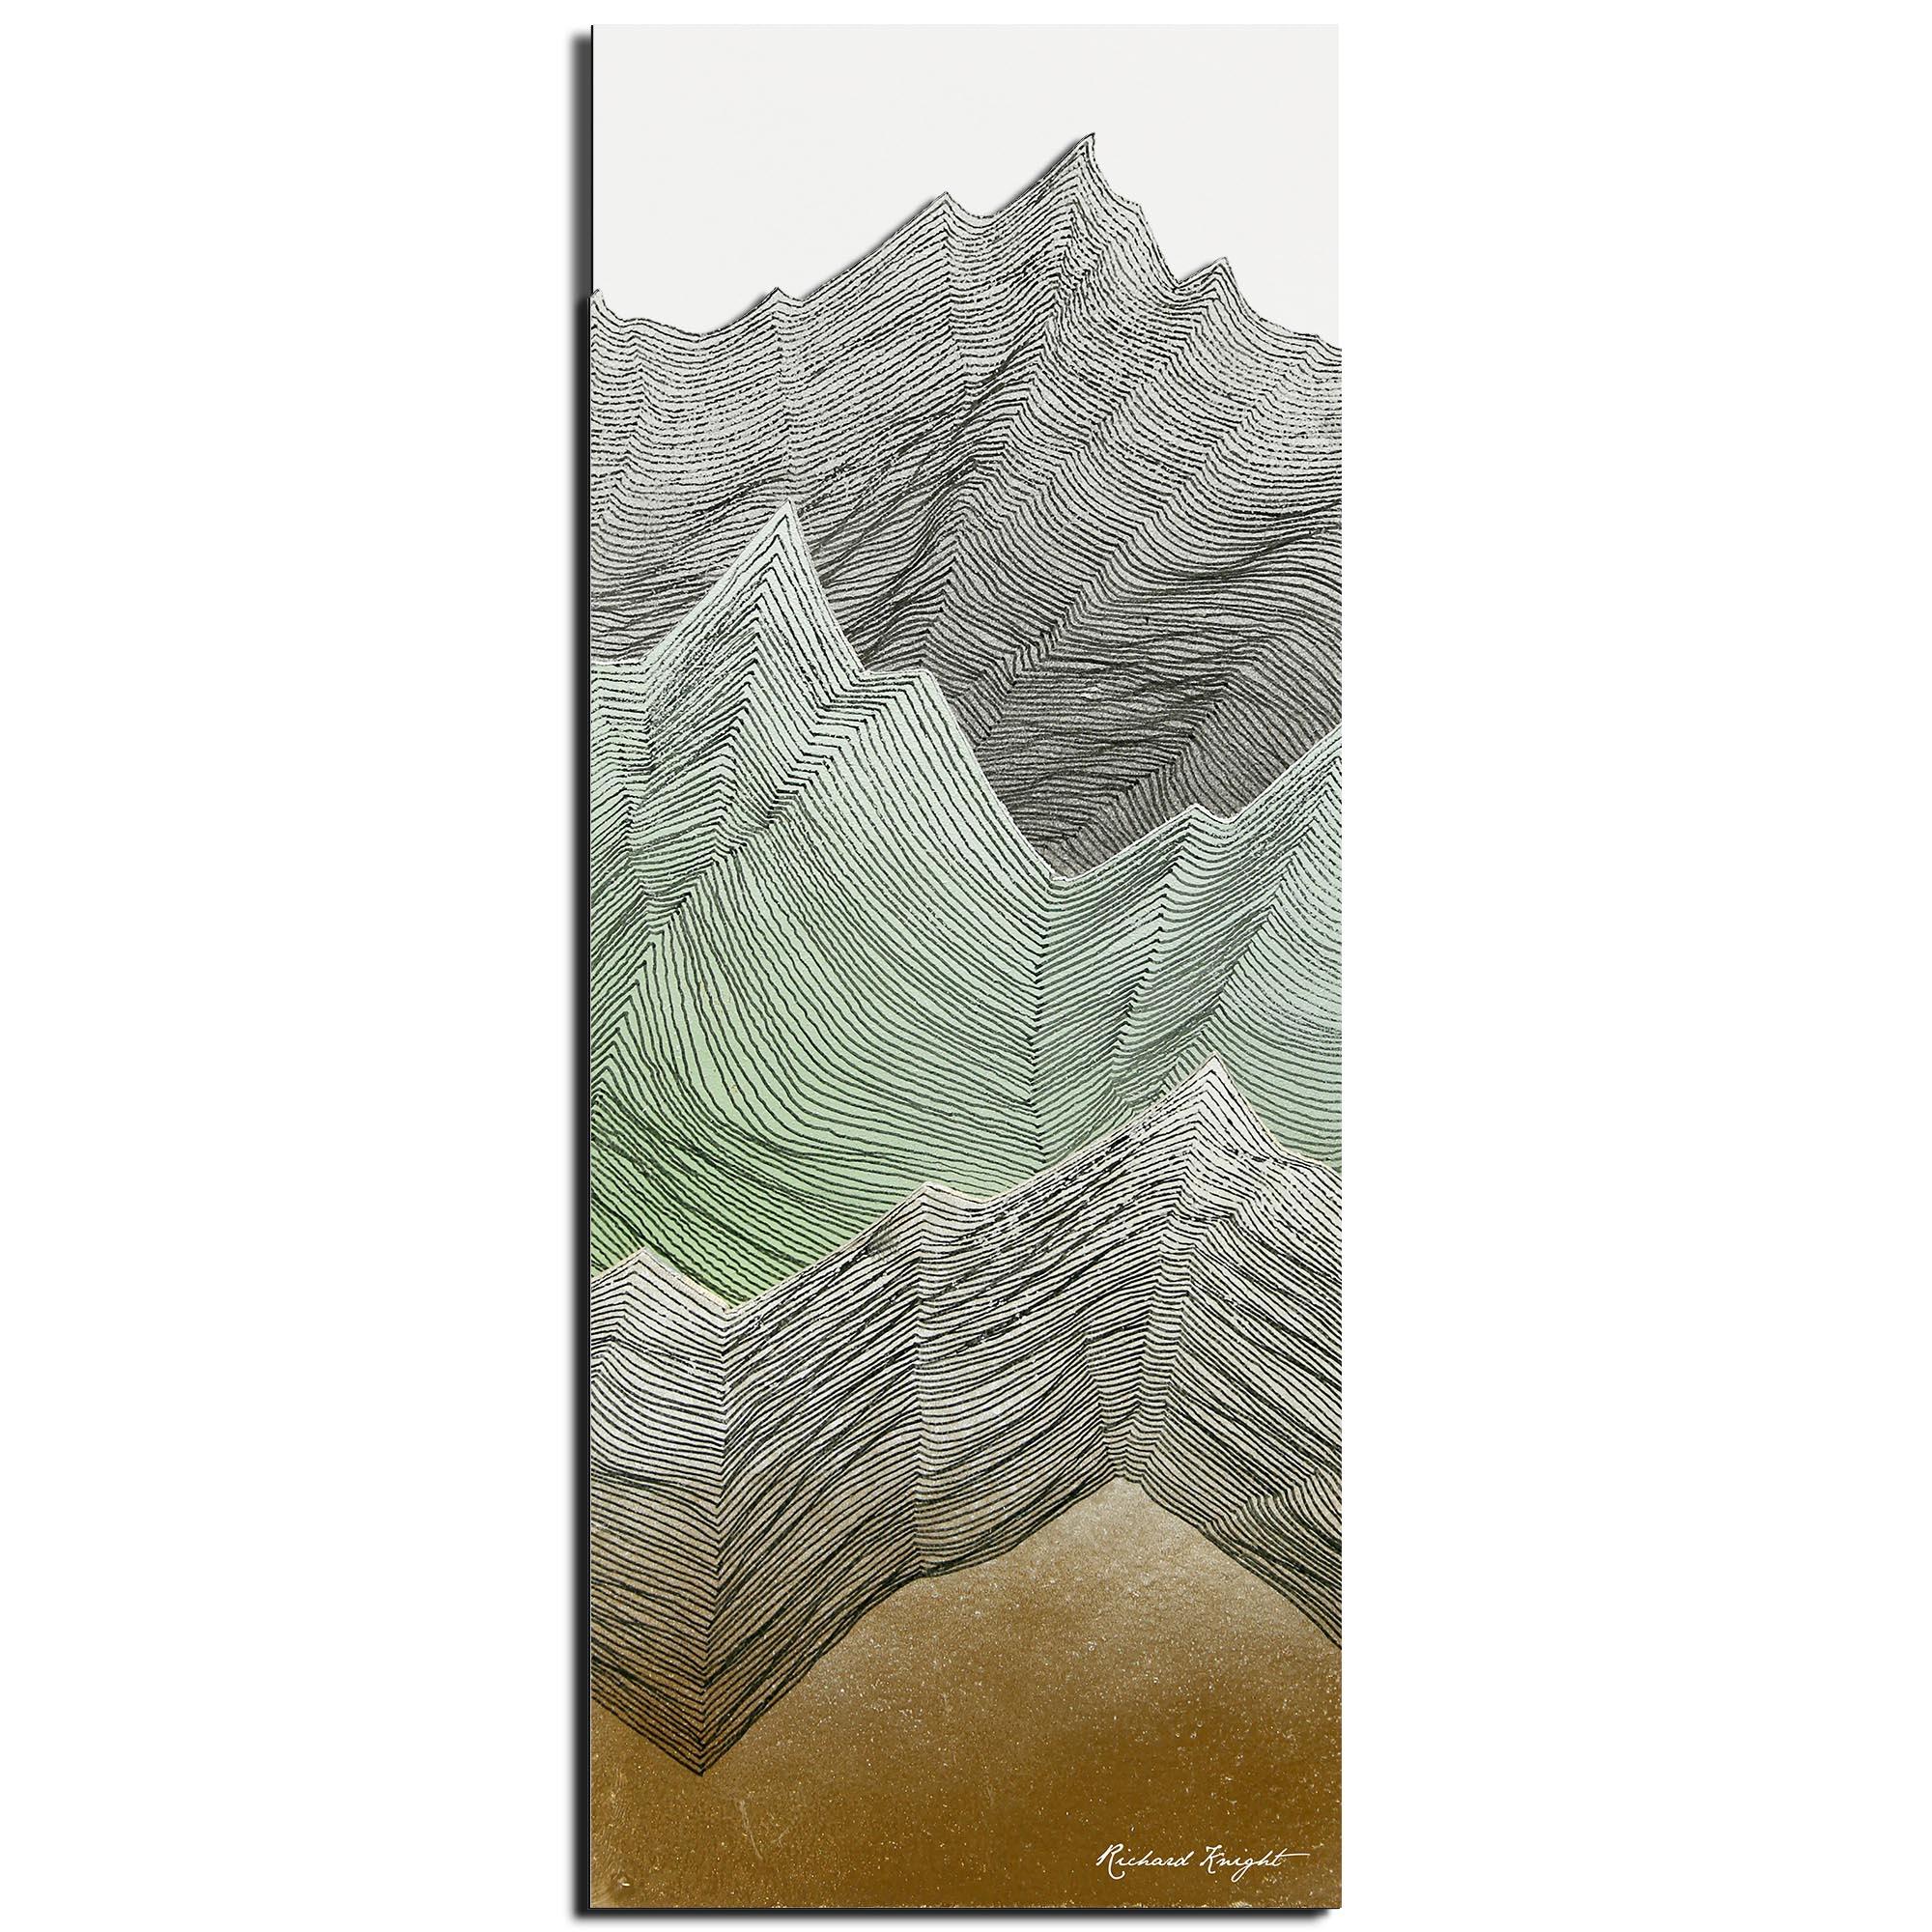 Richard Knight 'Mint Peaks' 19in x 48in Abstract Landscape Art on Polymetal